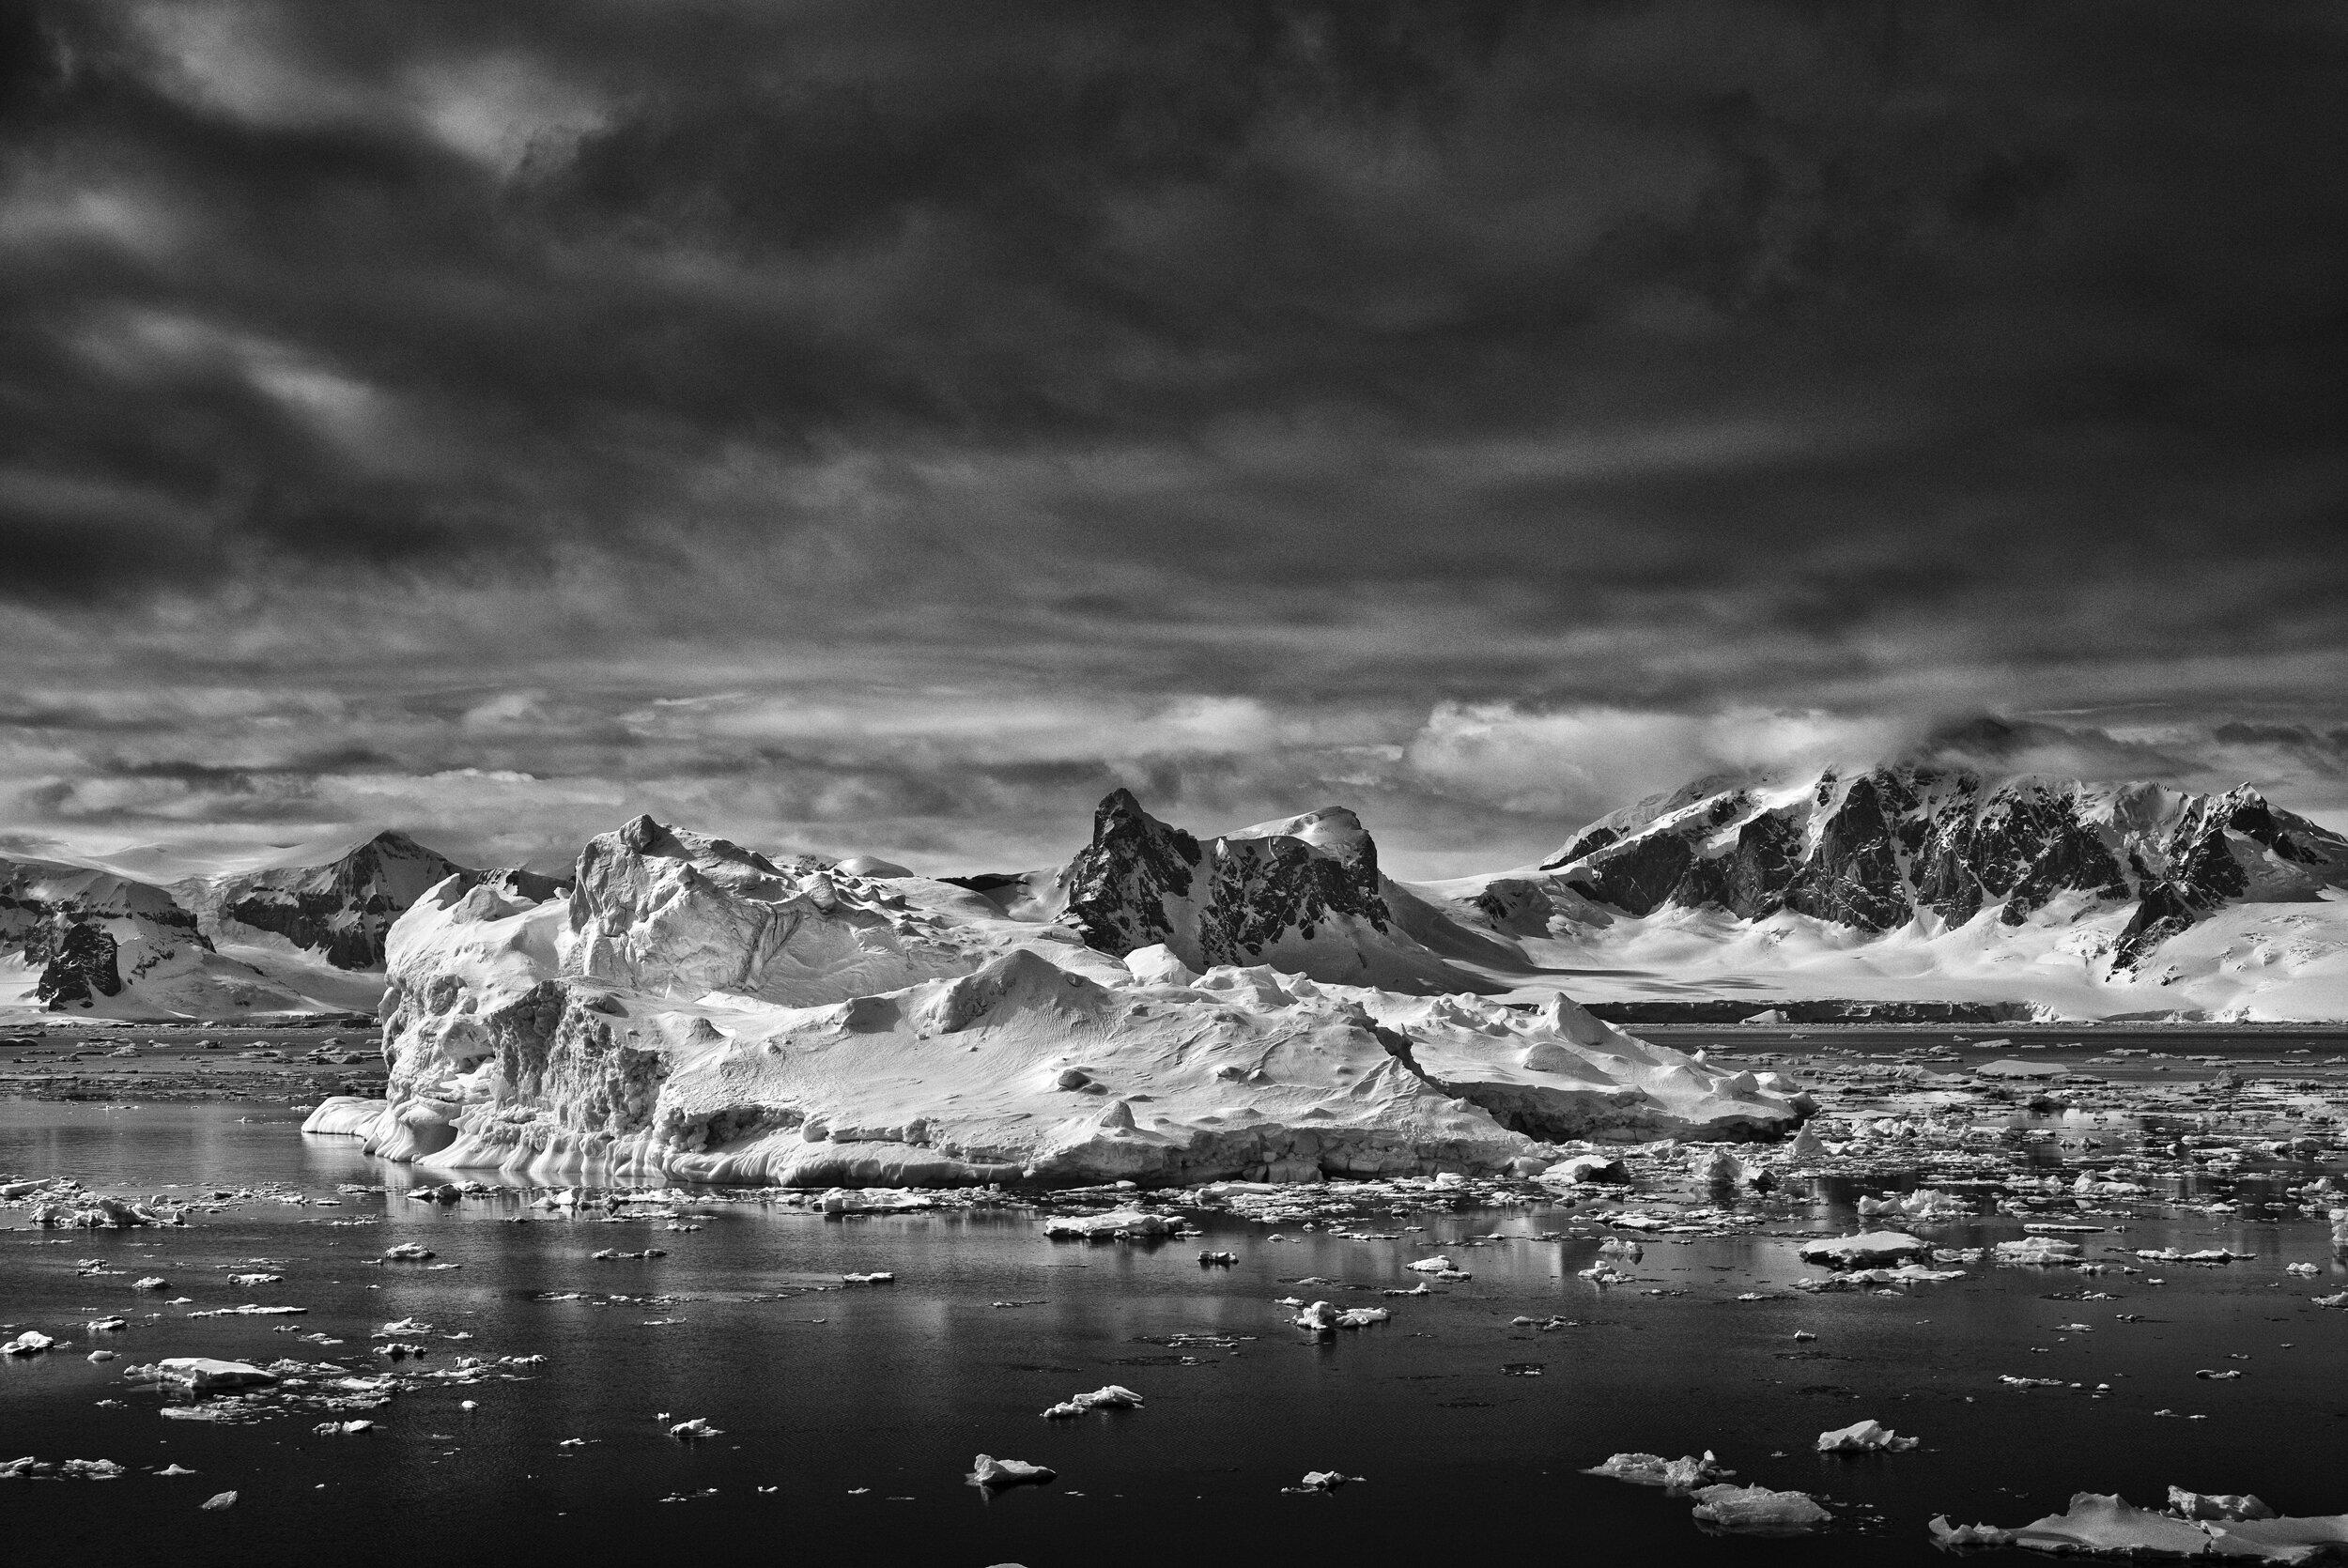 manuel_uebler_antarctica_bw_006.jpg